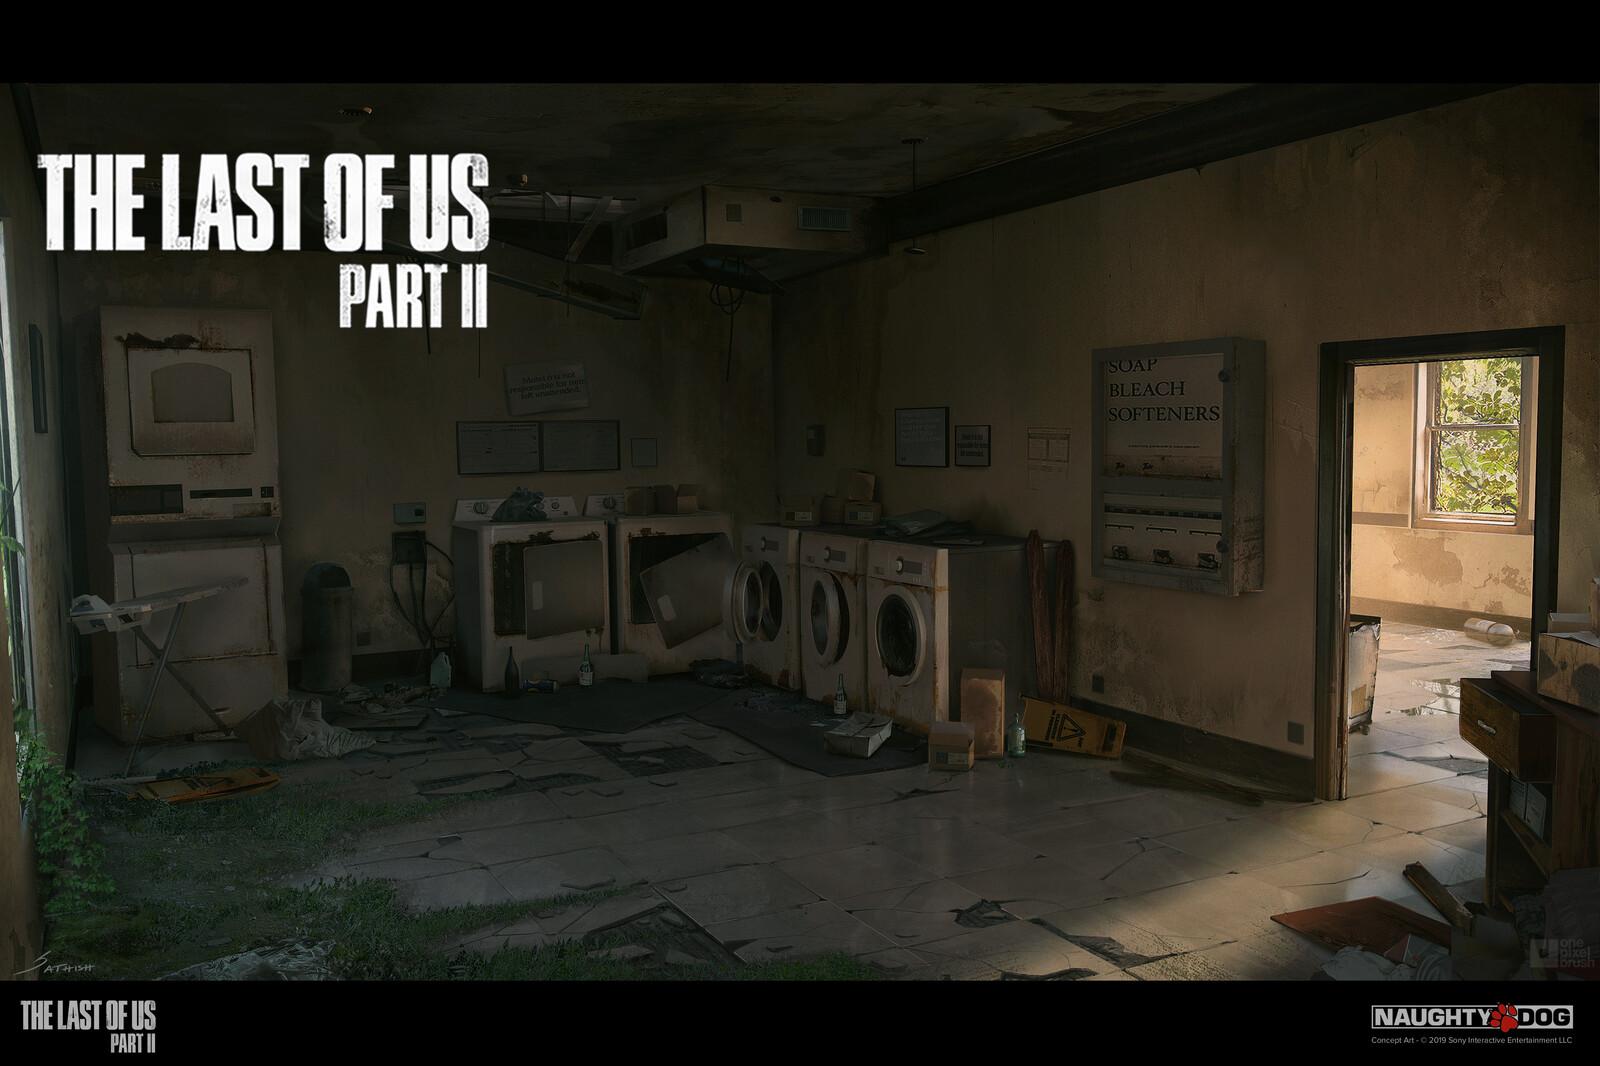 The Last of Us: Part 2 Boutique-Motel Laundry